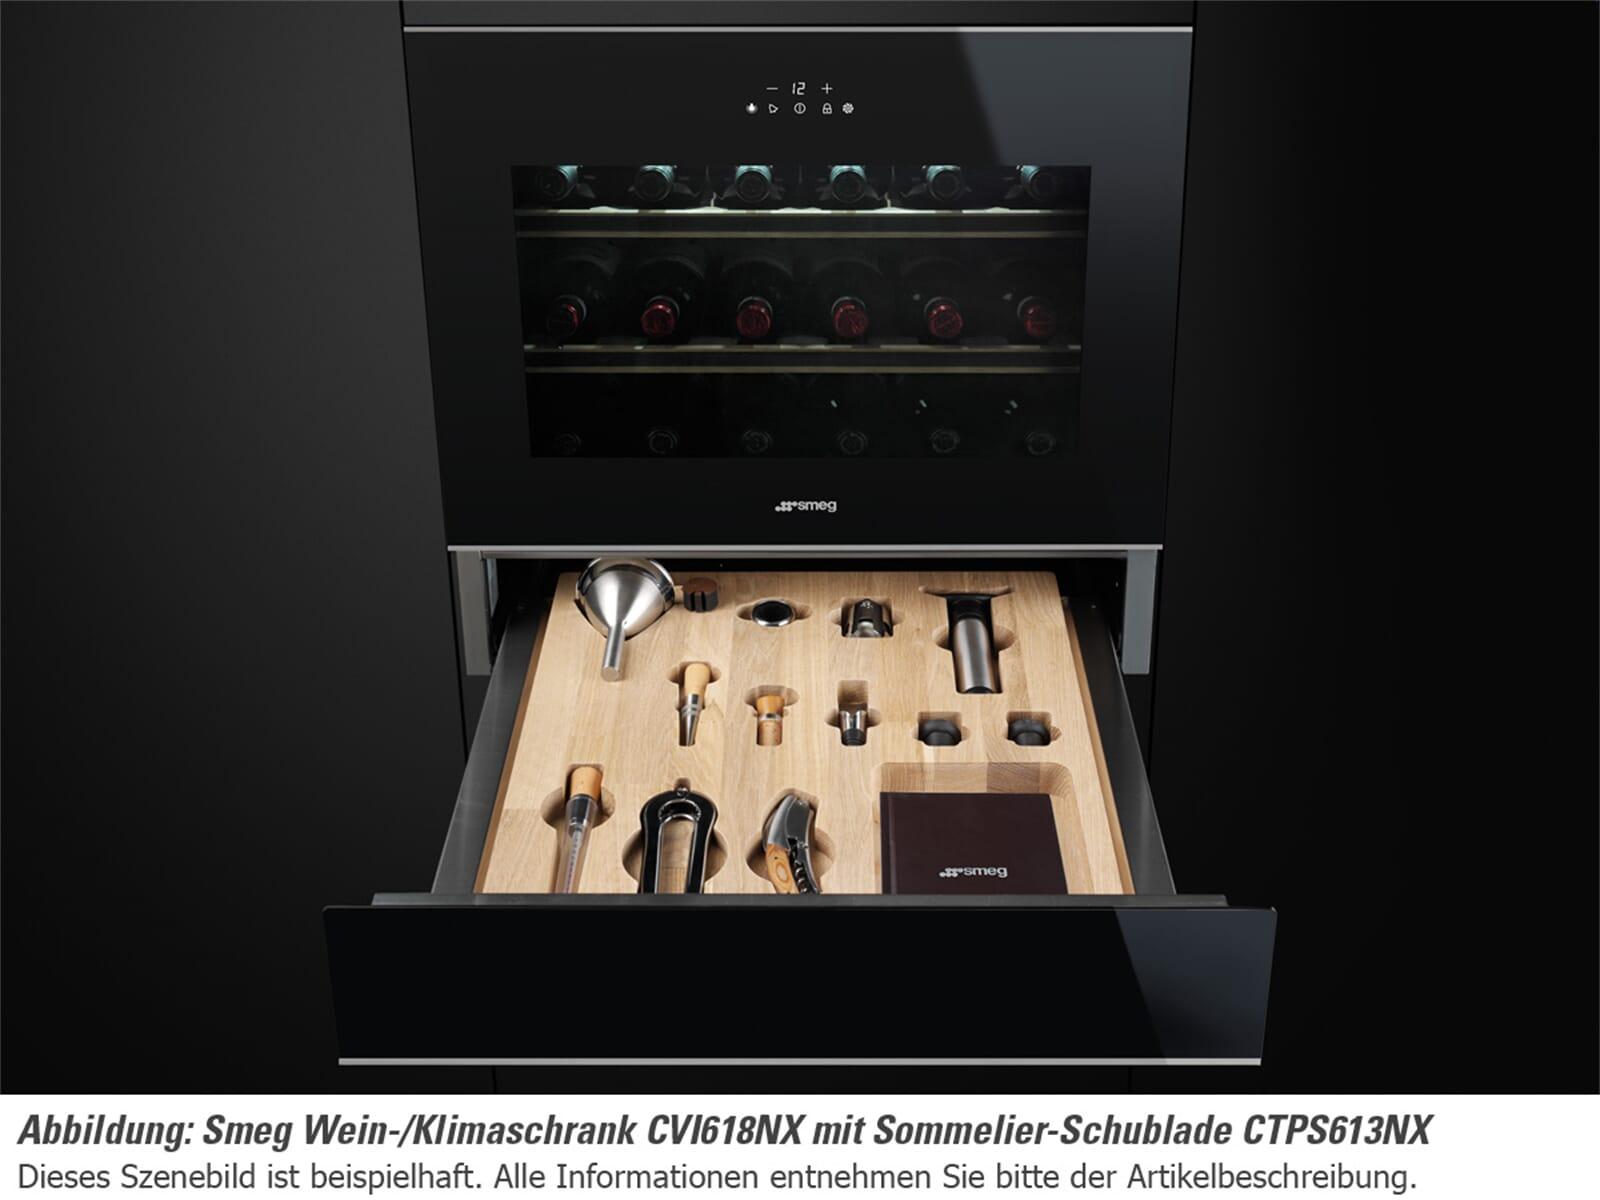 Smeg Kühlschrank Knallt : Tolle smeg kühlschrank rot fotos wohnzimmer dekoration ideen